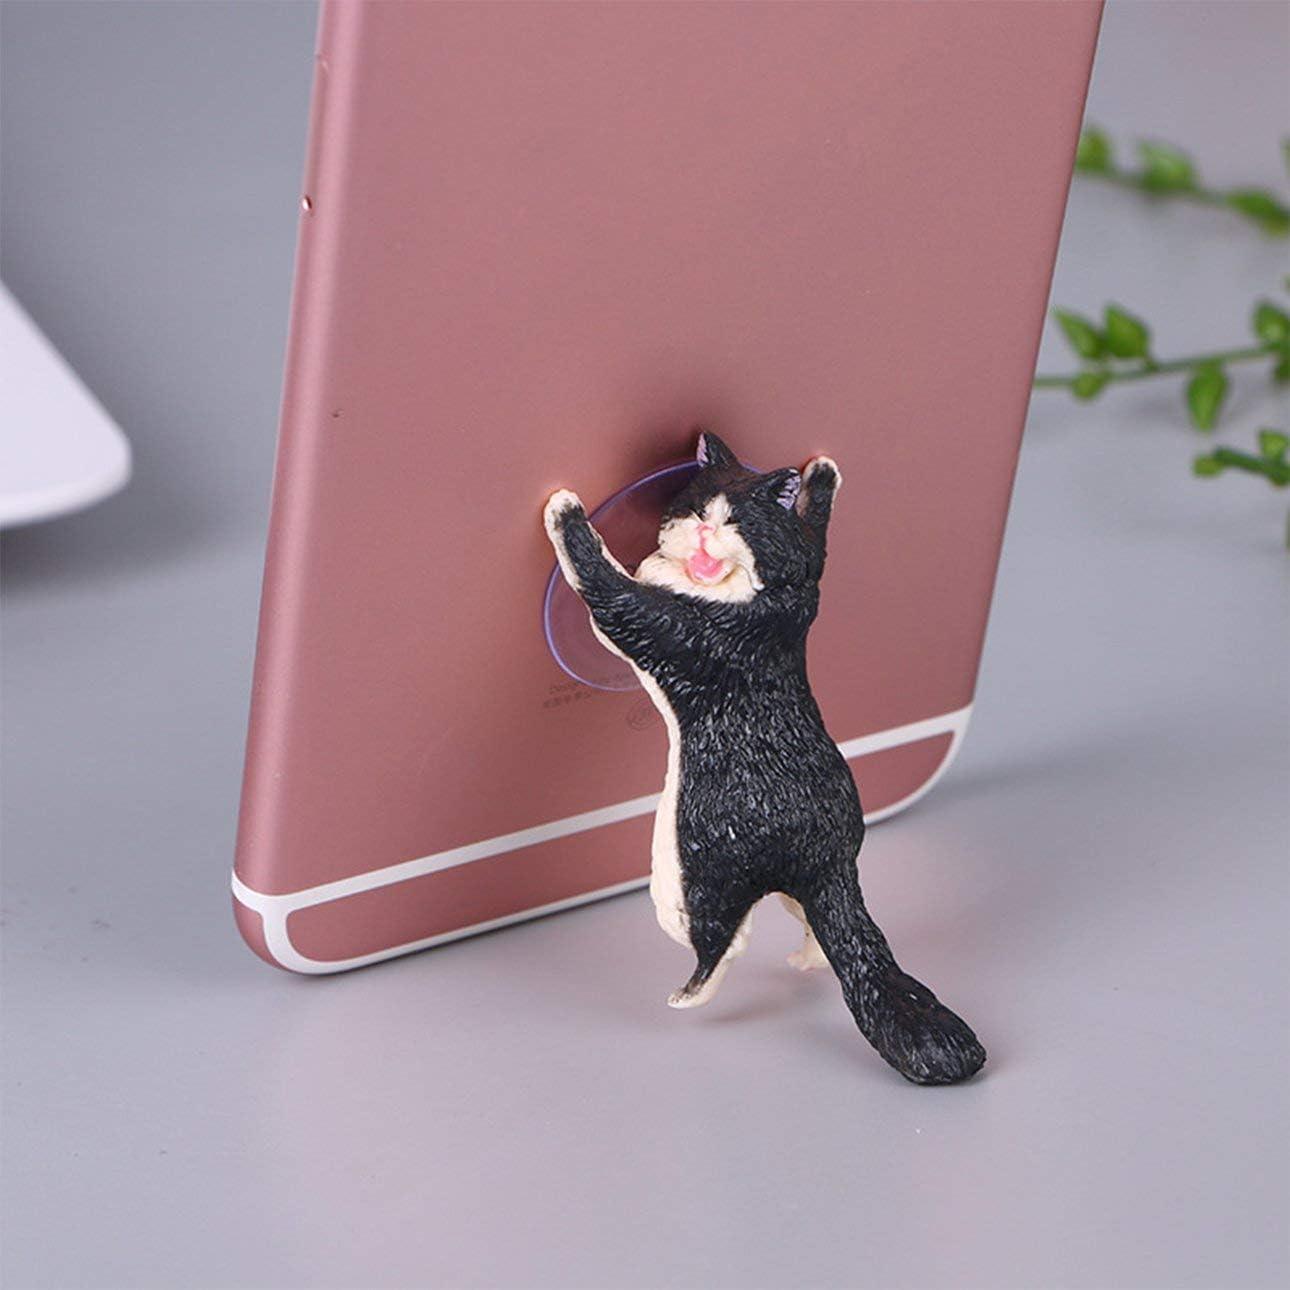 Liobaba Smart Phone Sucker Holder Cute Cat Support Resin Cell Phone Holder Stand Sucker Tablets Desk Sucker Smartphone Holder